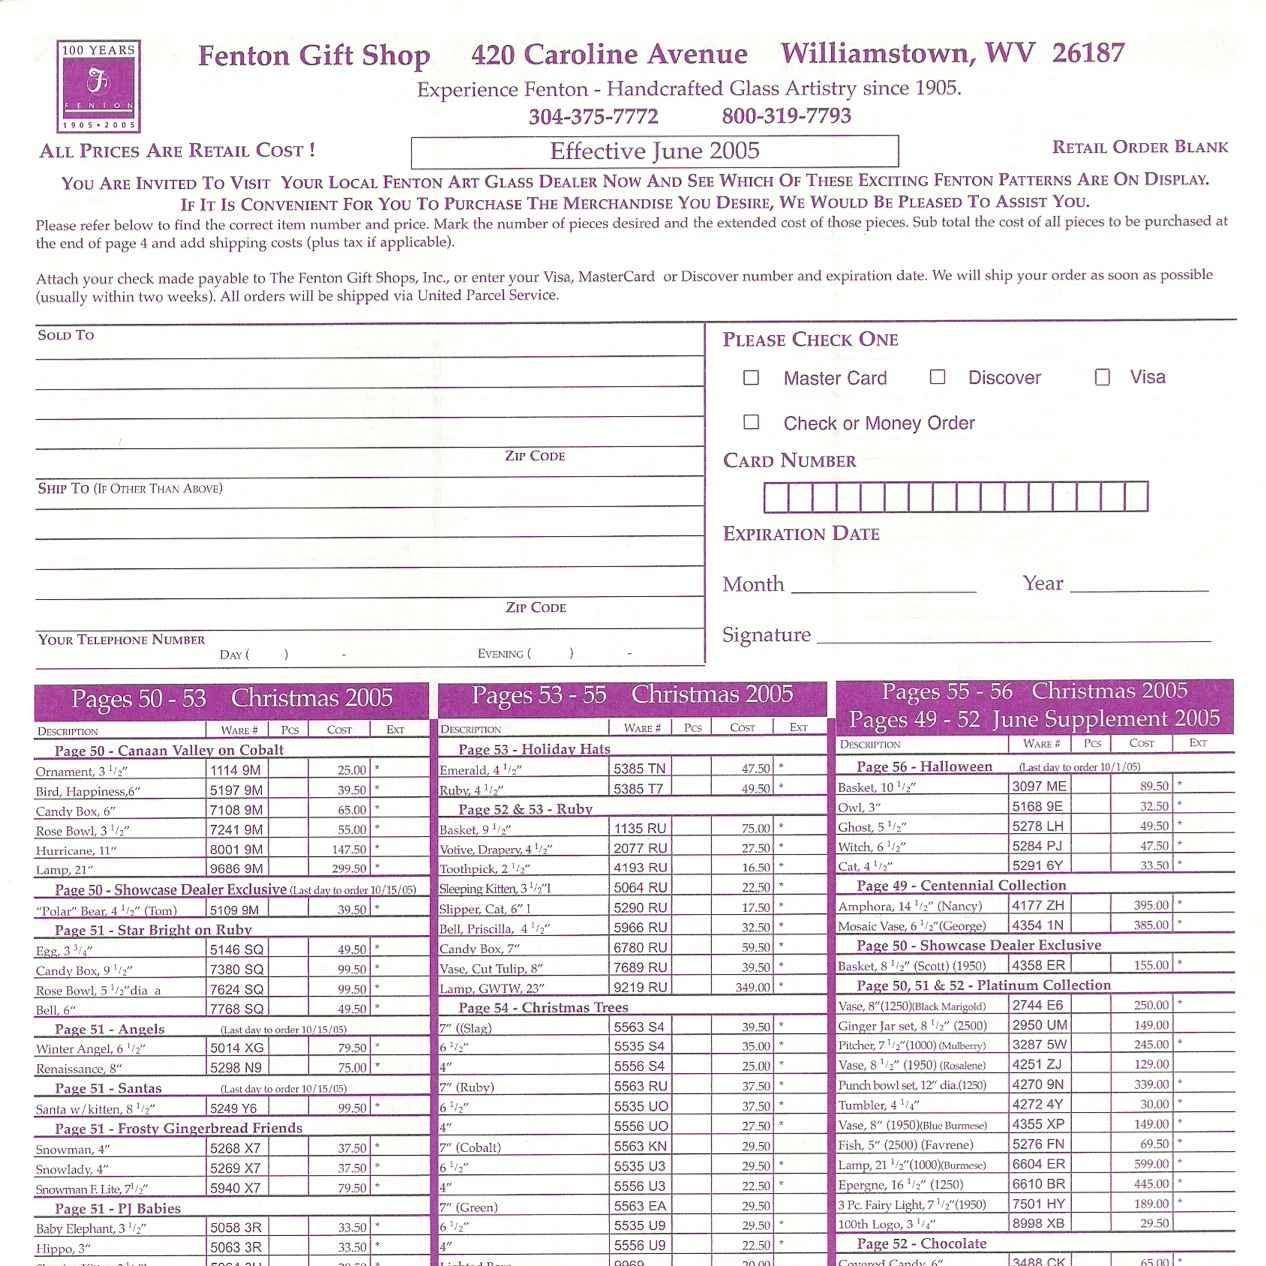 2005 June Price Guide